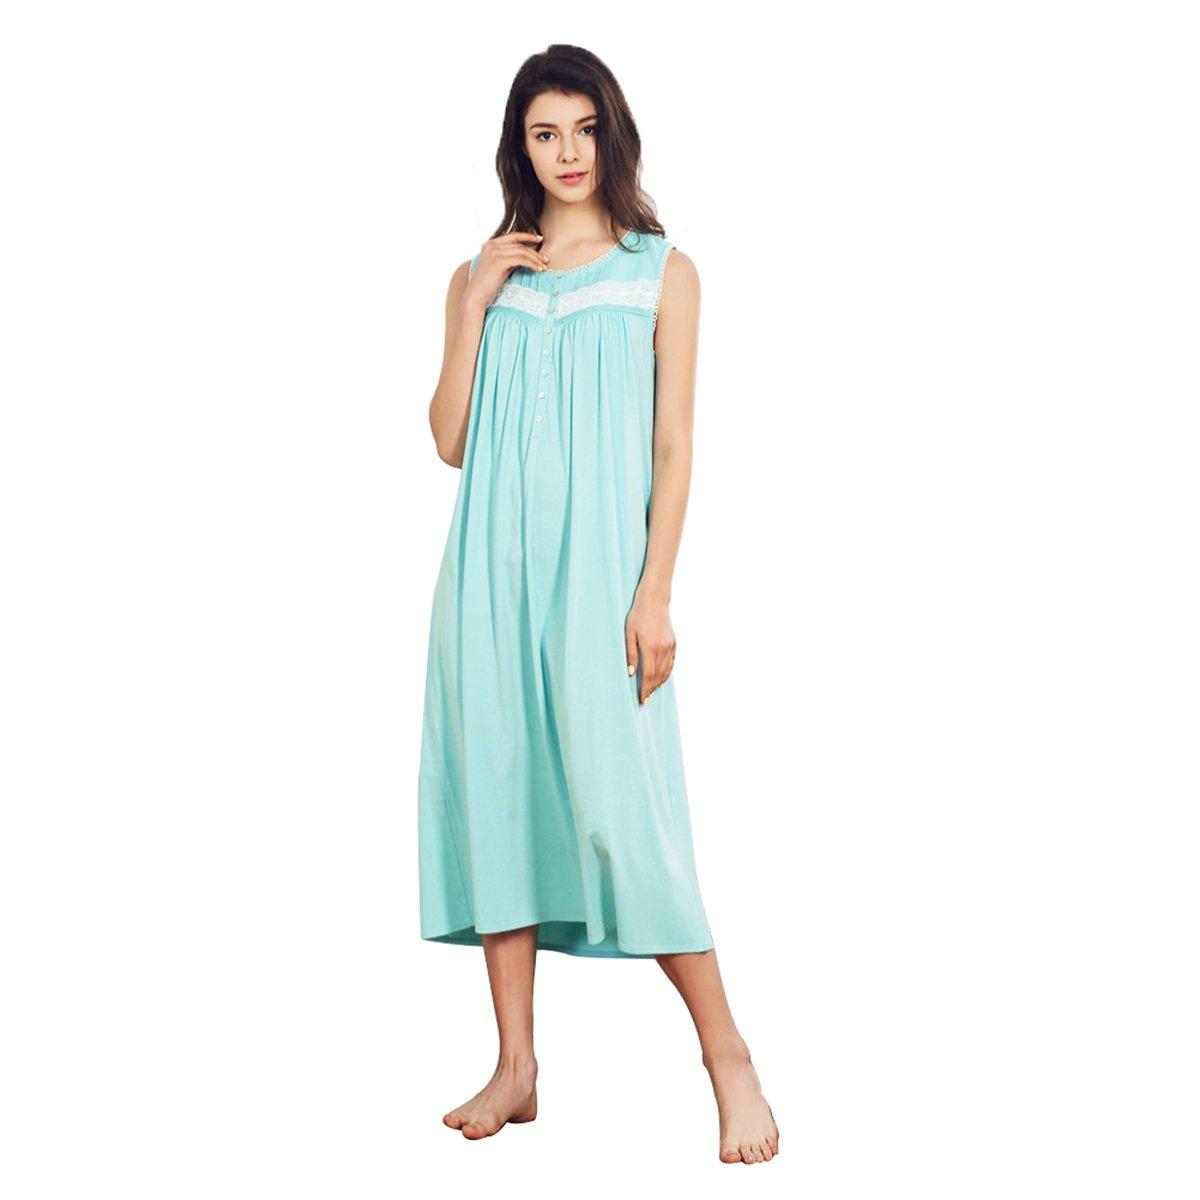 Dorekim Women s 100% Cotton Sleeveless Round Neck Long Sleepwear Nightgown  DK6808 (S) at Amazon Women s Clothing store  9a7ec8c5f